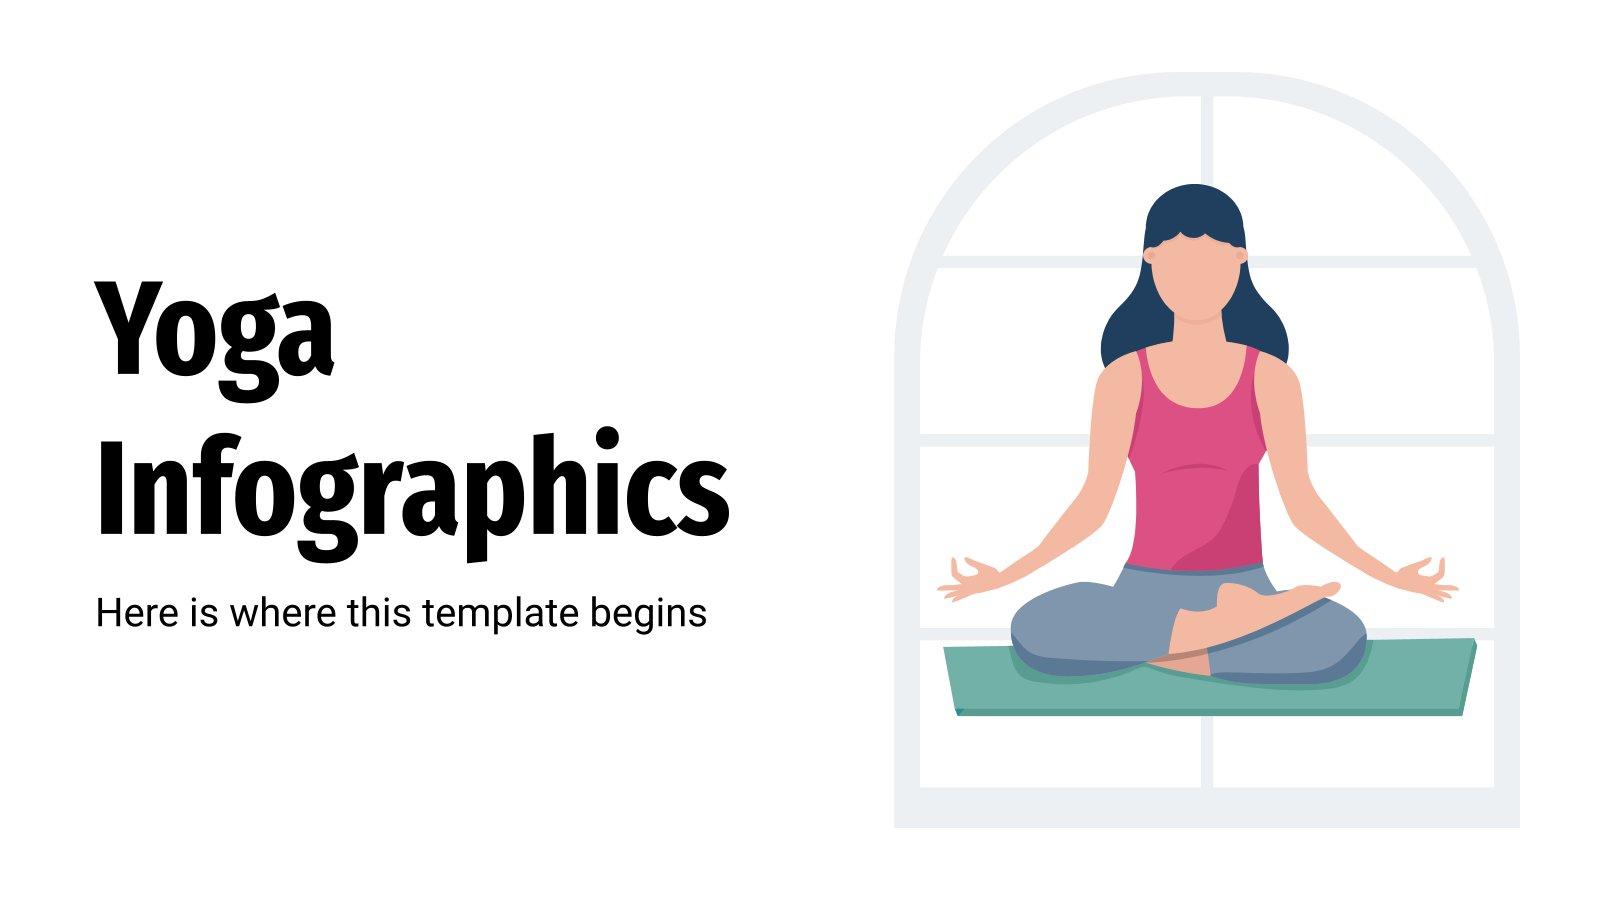 Yoga Infographics presentation template